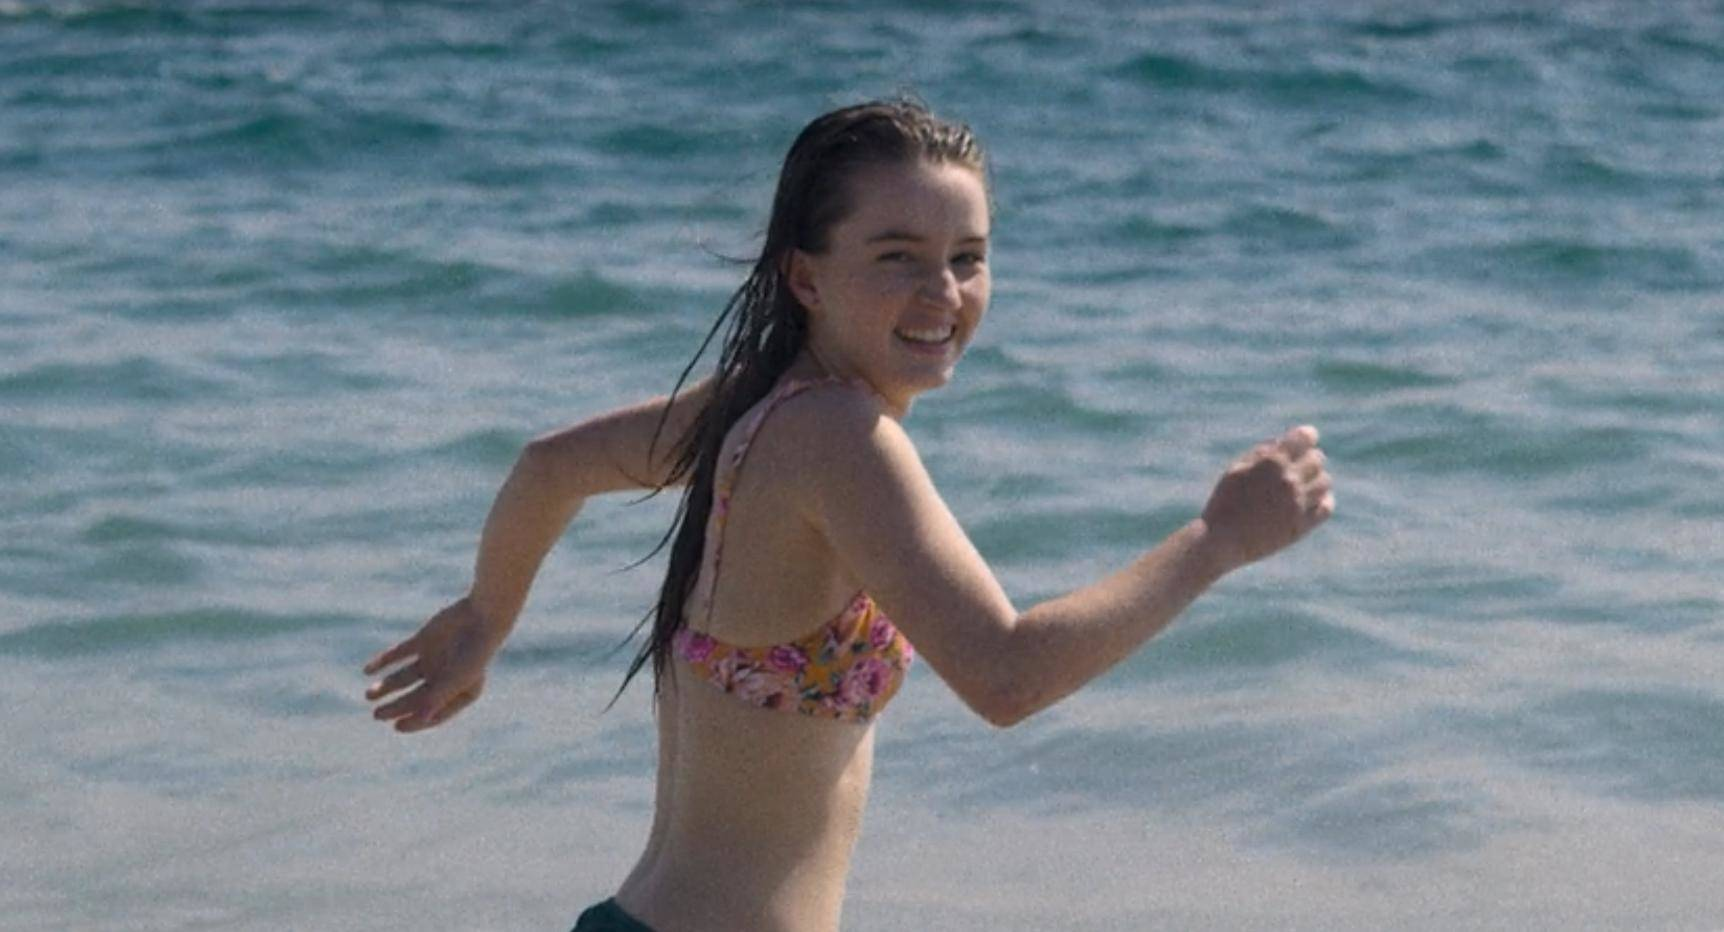 Kaitlyn Dever protagonista di Unbelievable